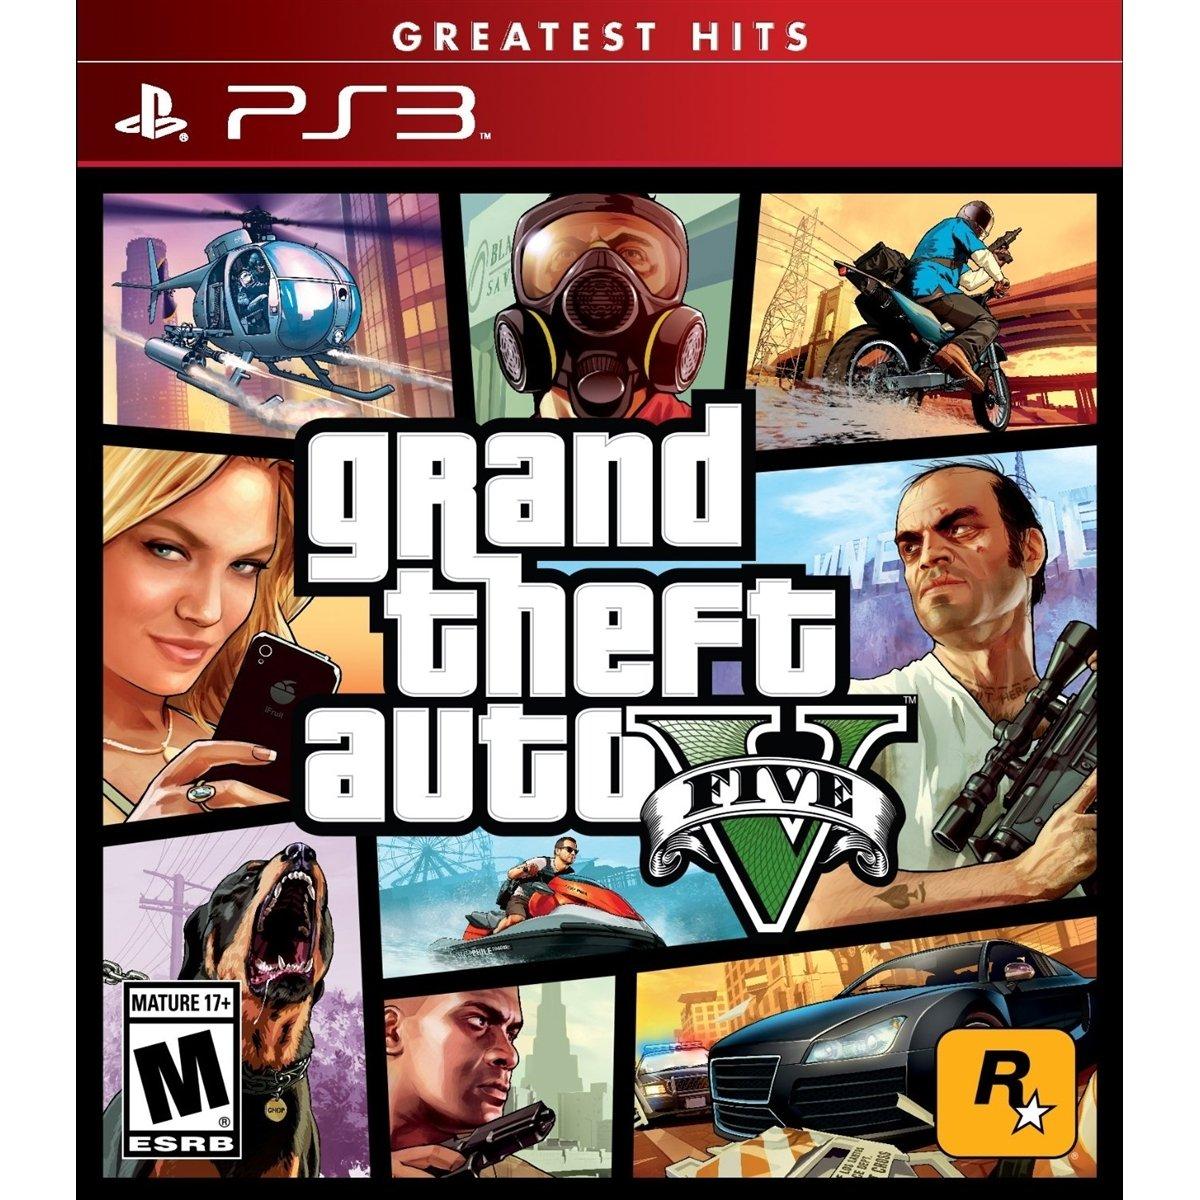 Jogo Gta Iv - Complete Edition - Playstation 3 - Rockstar Games